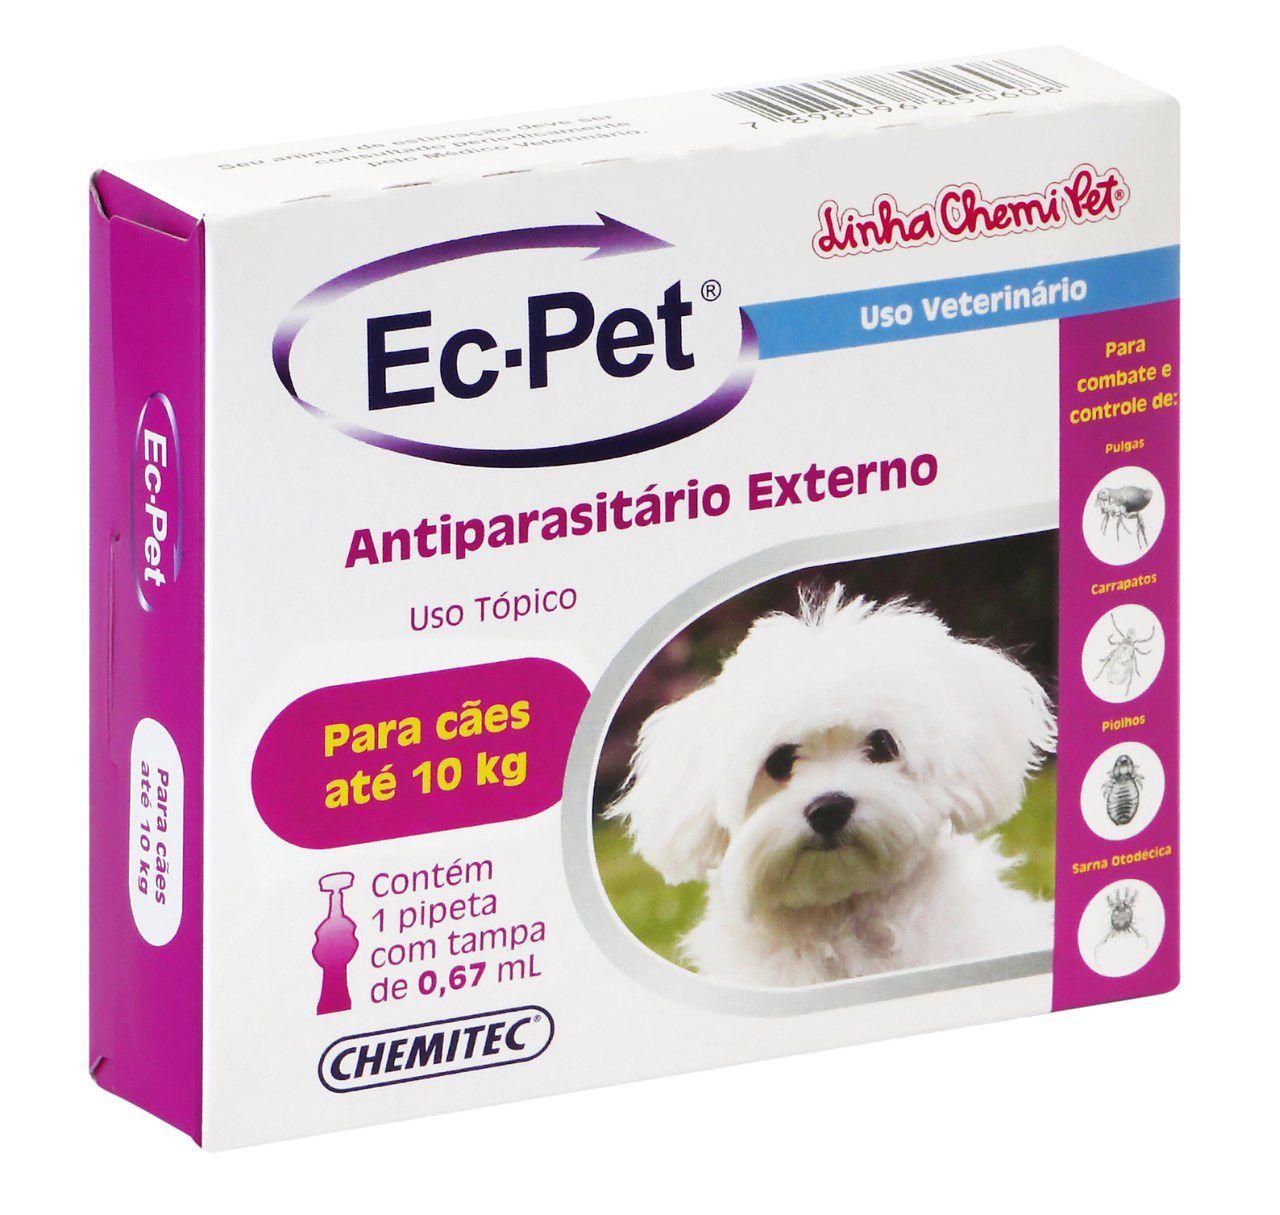 Ec-Pet 0,67 Ml